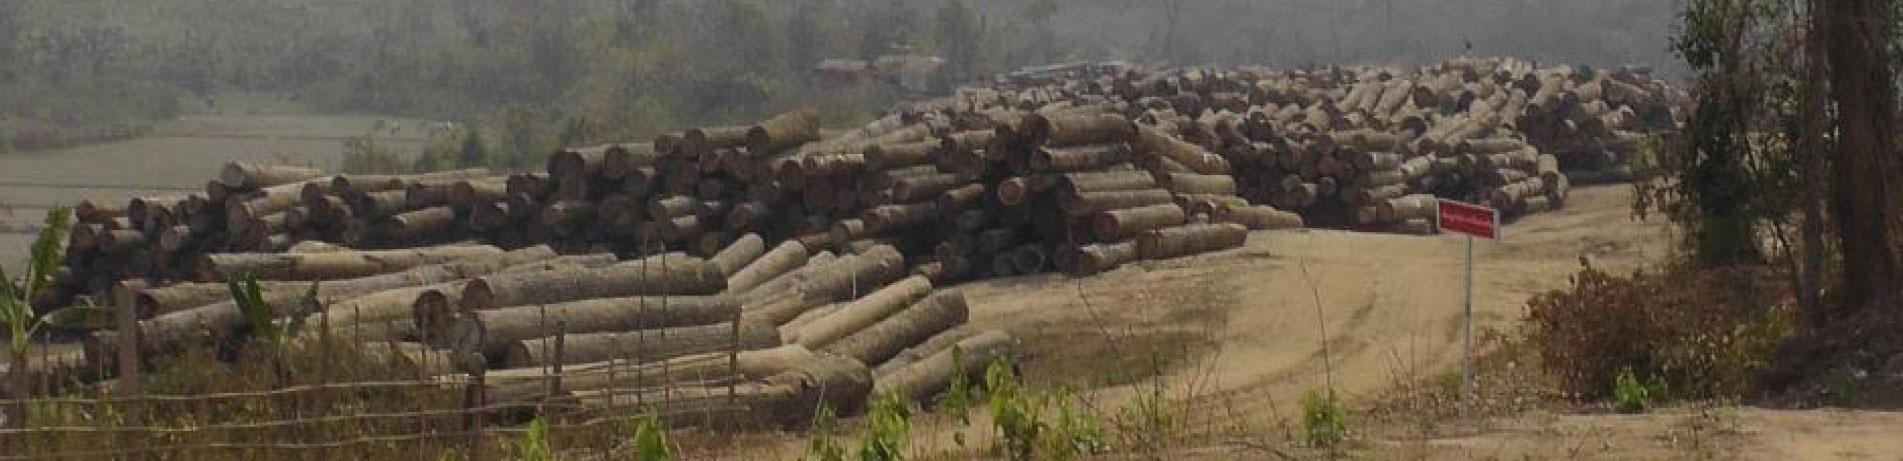 Log depot, Myanmar